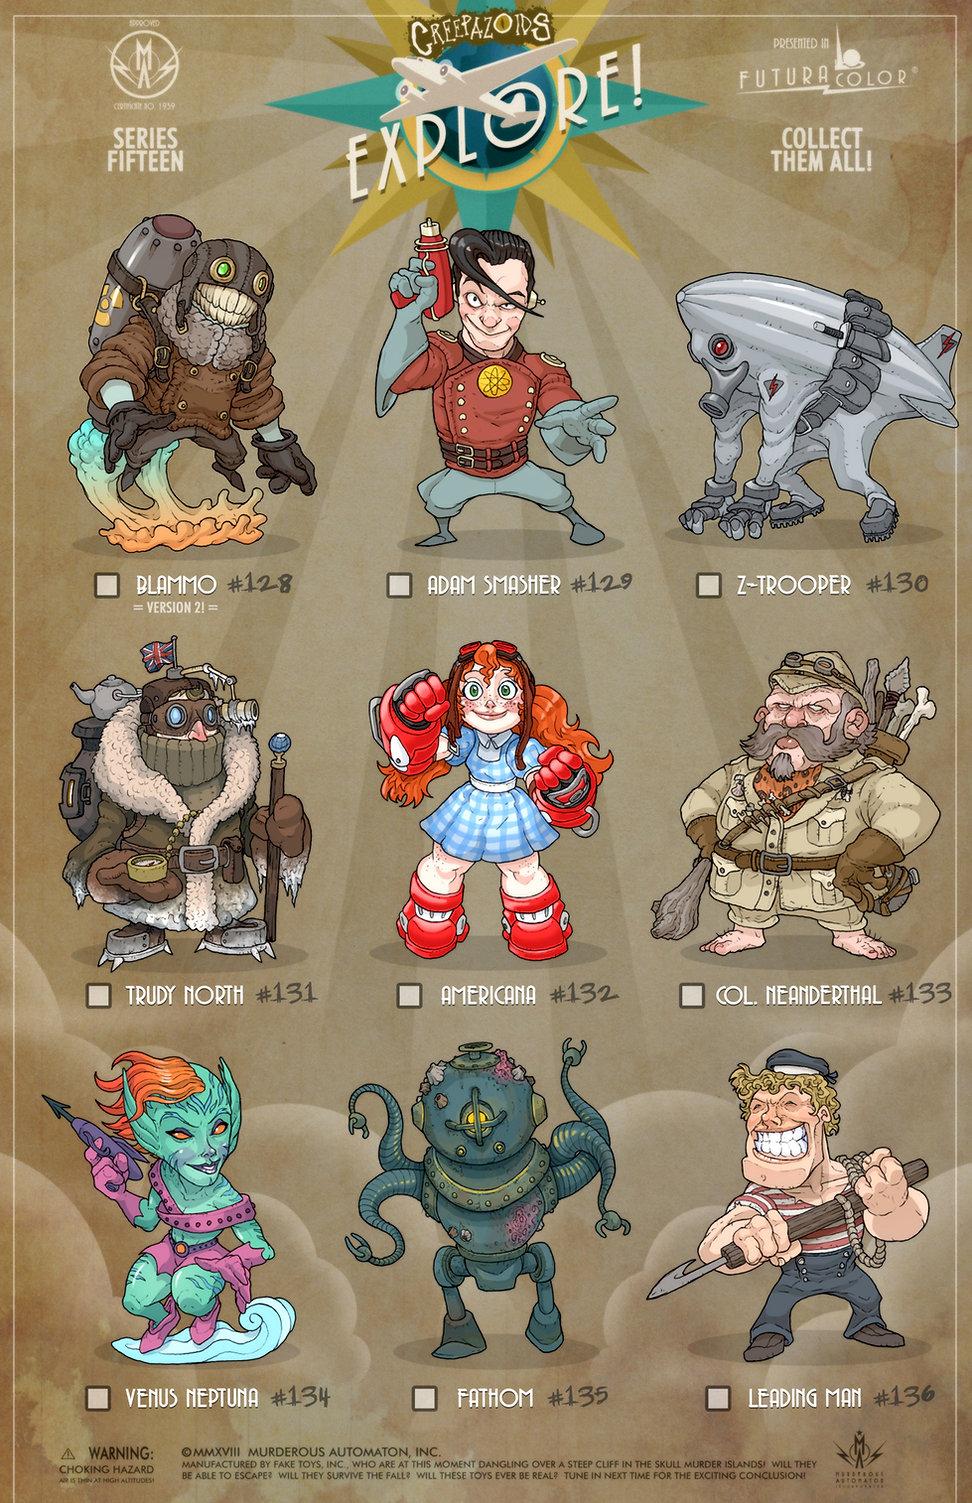 15 Creepazoids--Explore!.jpg